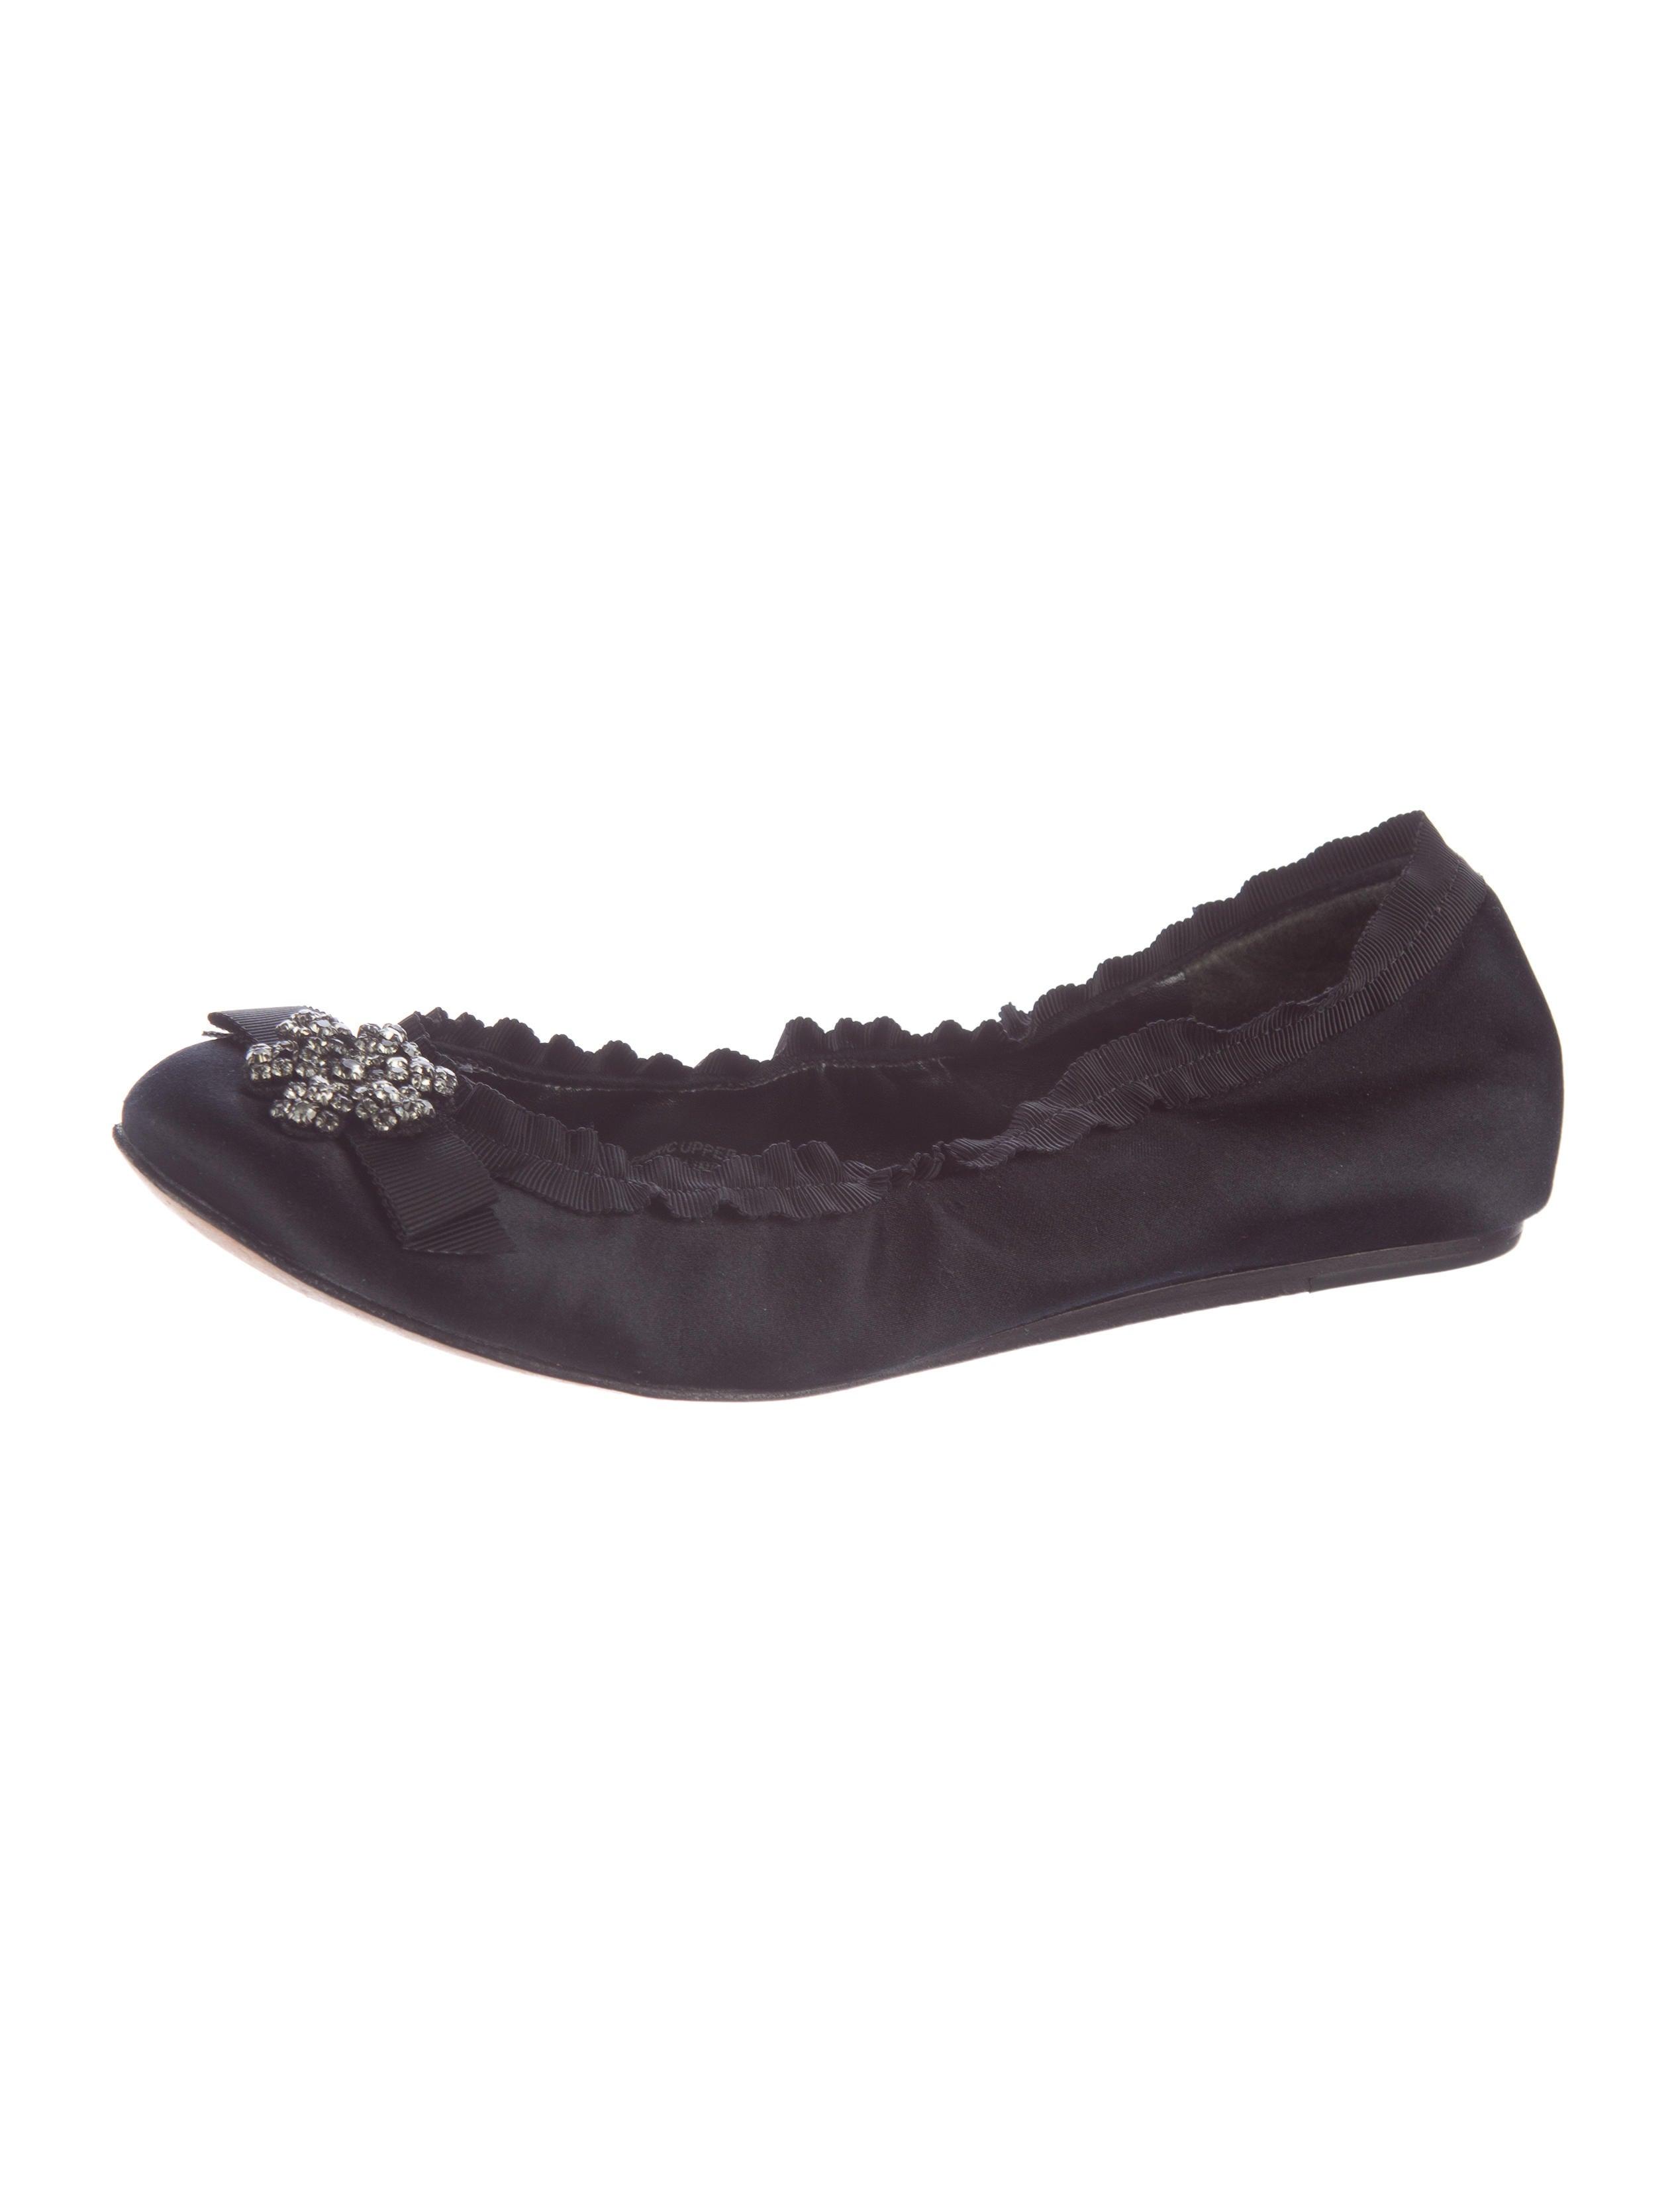 Vera Wang Flats Lavender Label Shoes